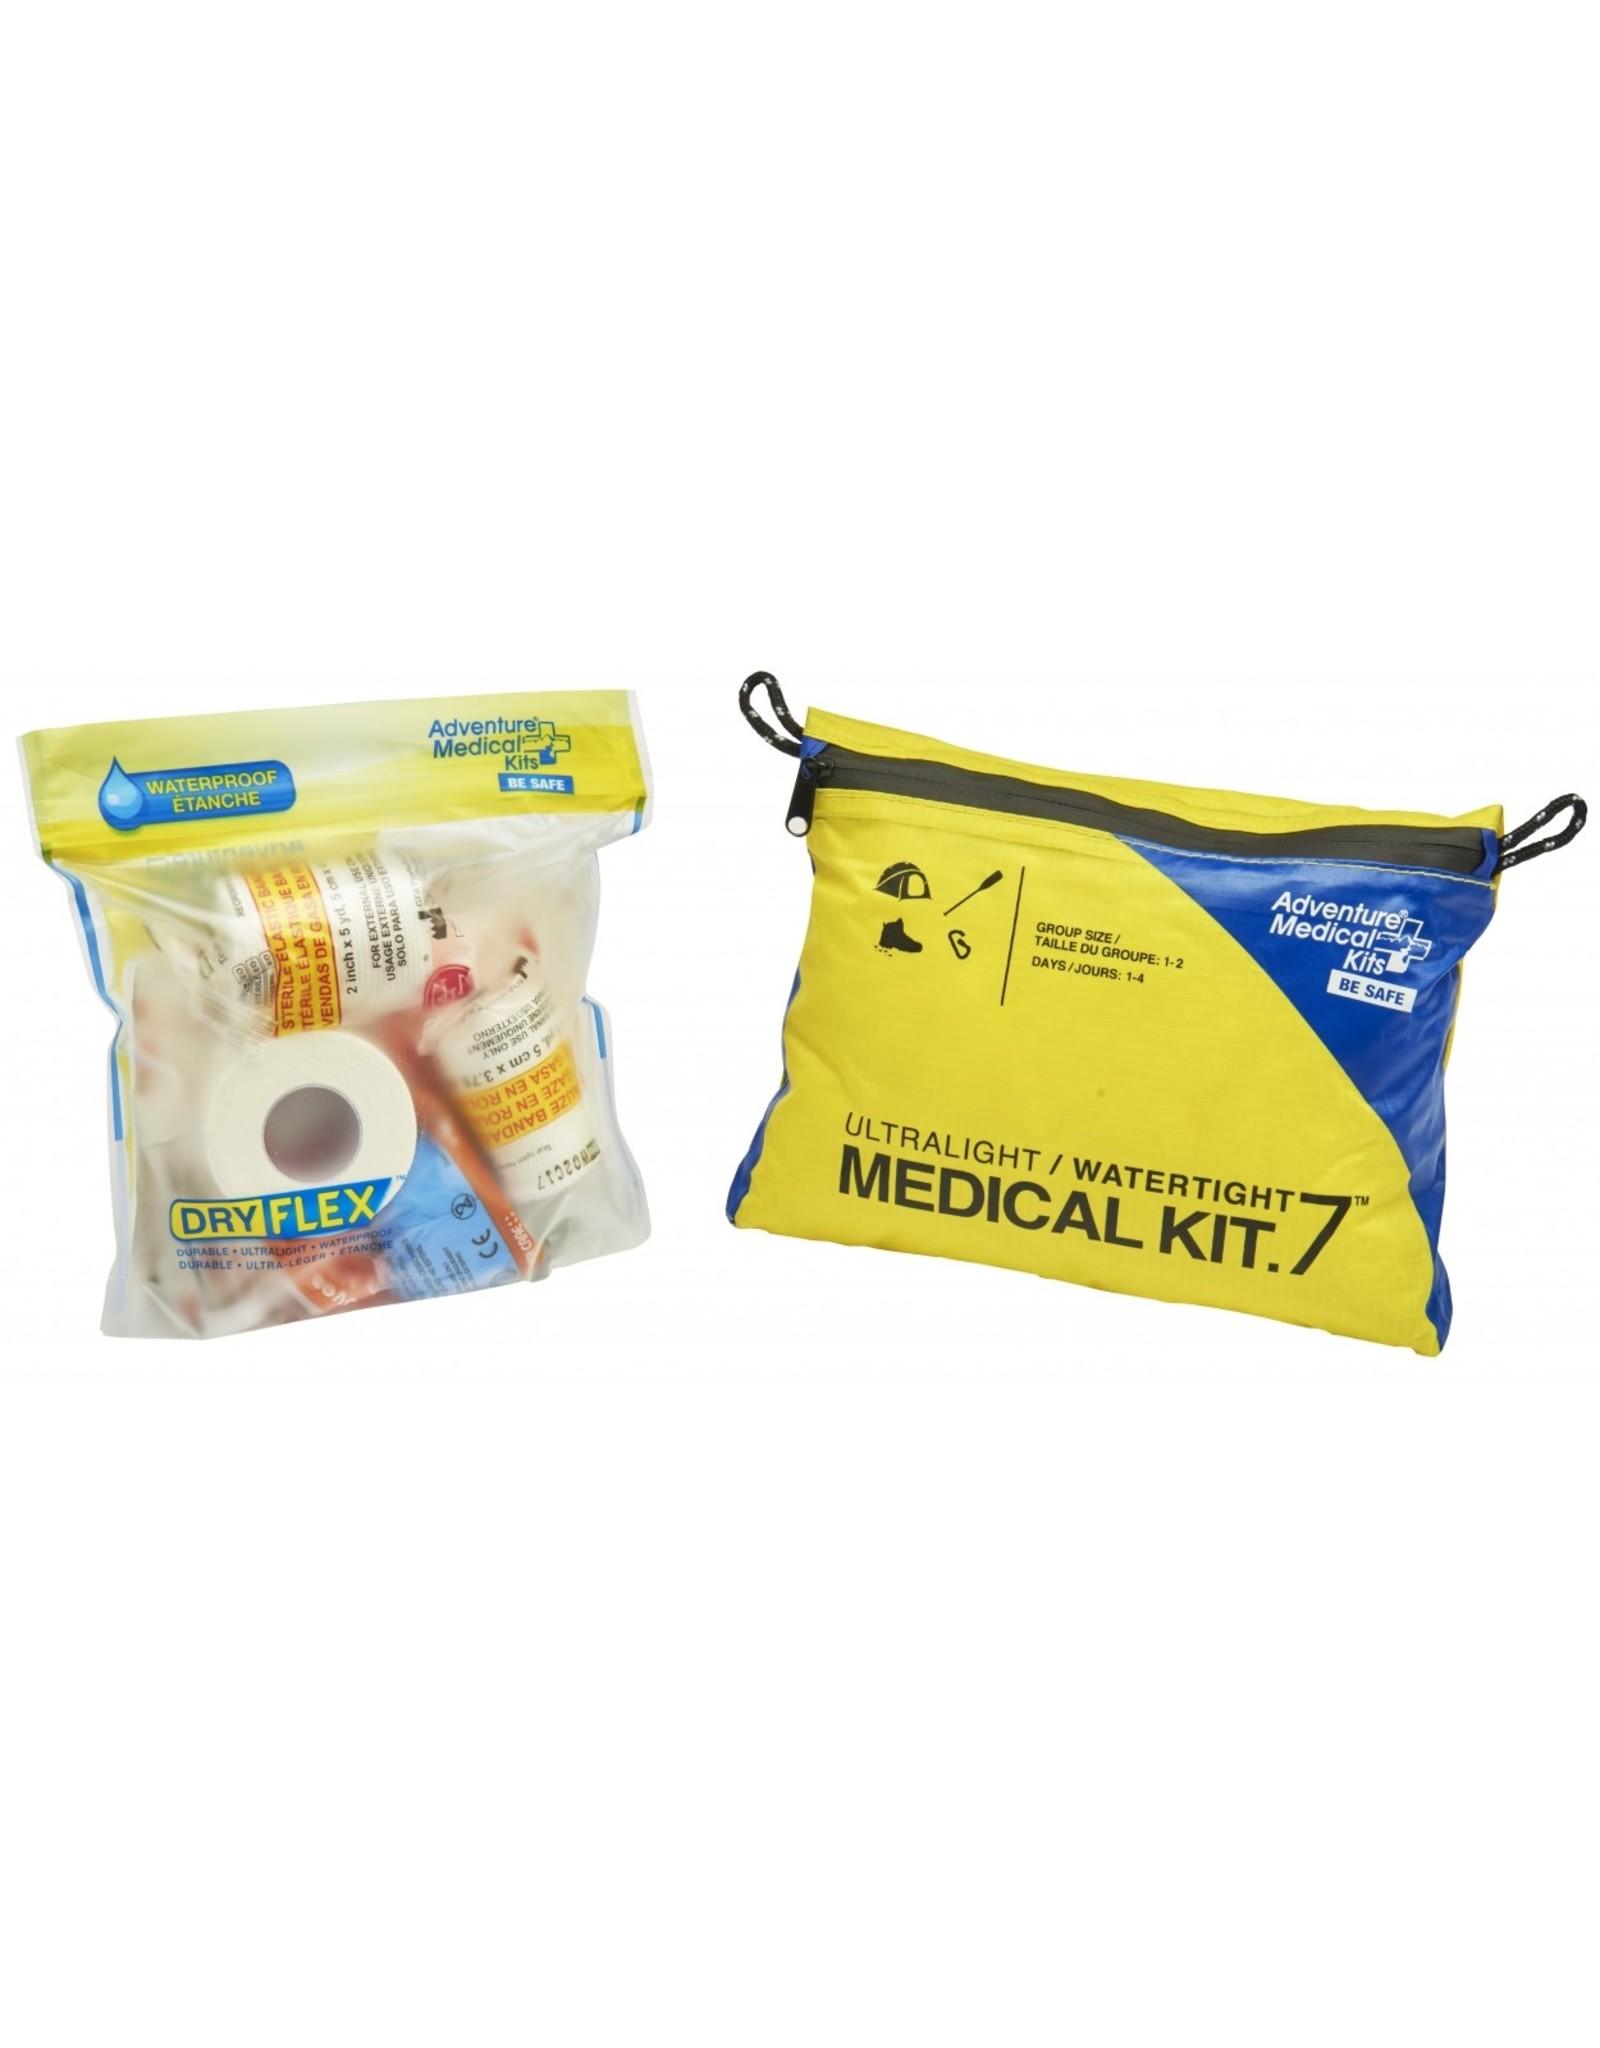 Adventure Medical Kits Adventure Medical Kits Ultralight & Watertight .7 Medical Kit